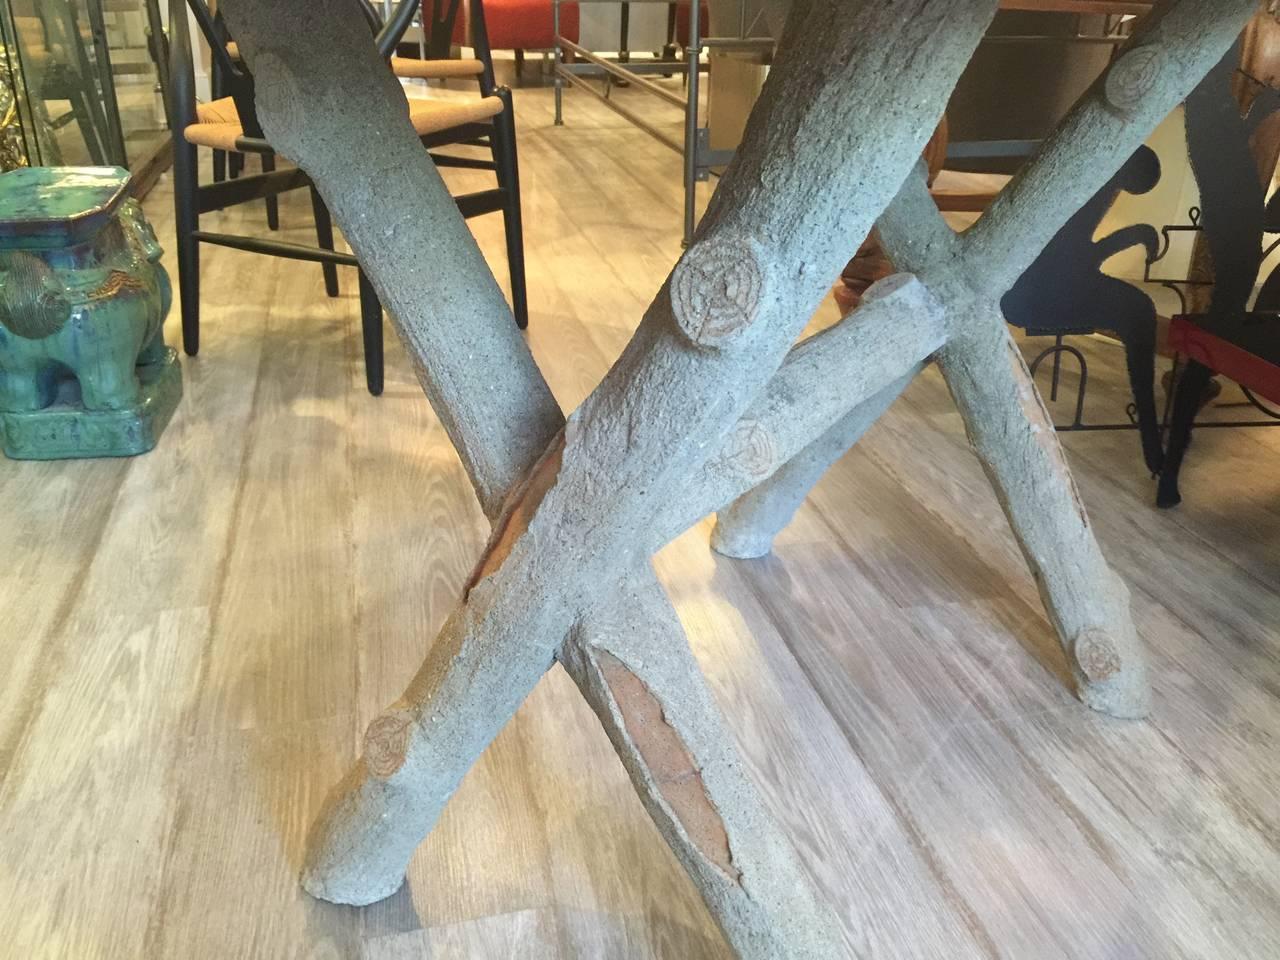 Table bois vintage - Sorbetiere manuelle bois ...